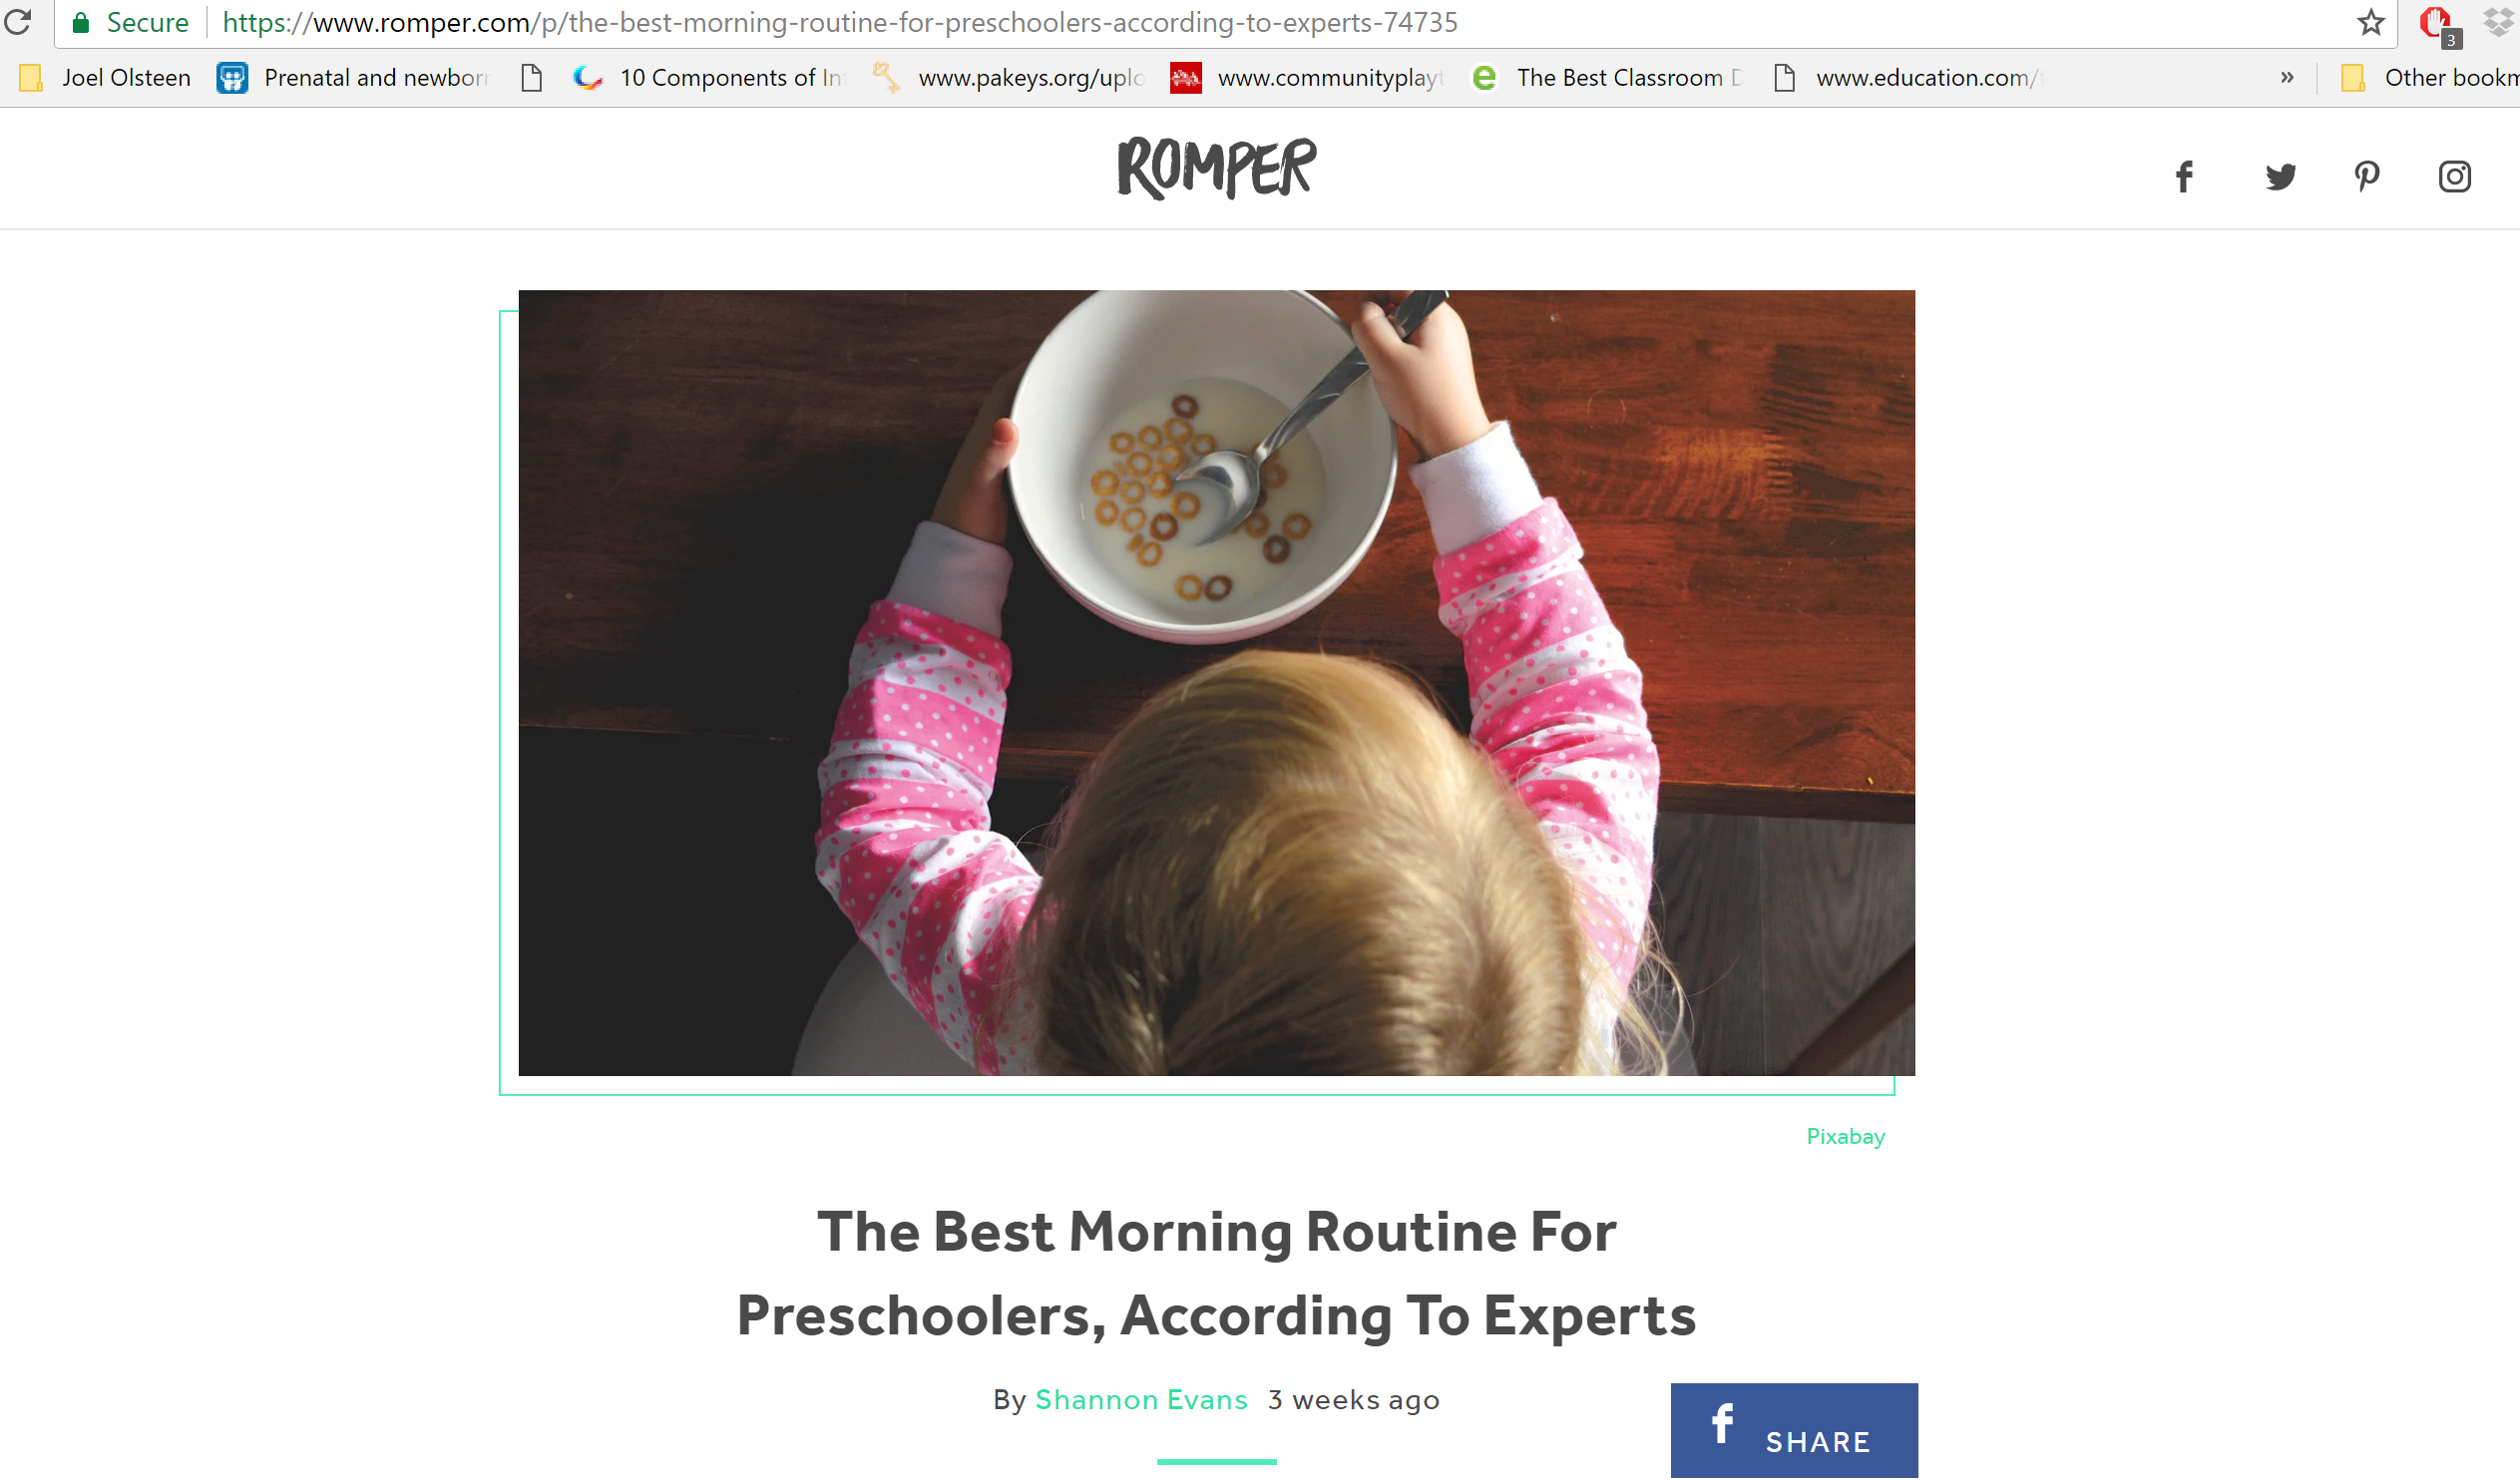 Romper.com